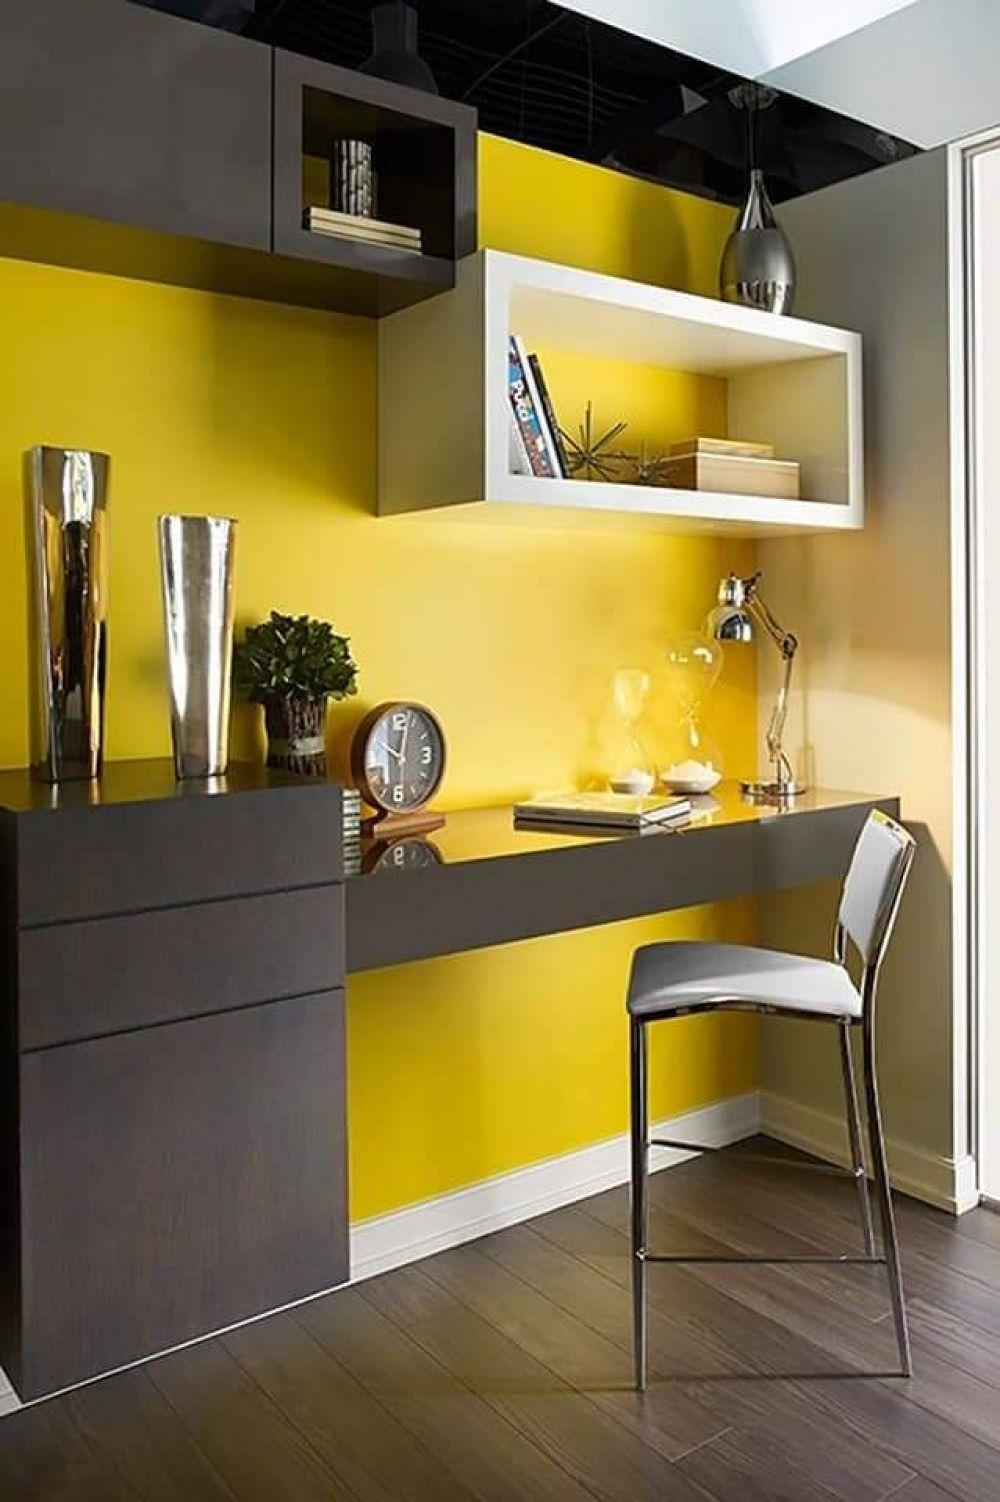 Room Design Image By Verne Lawrence On Home Decor